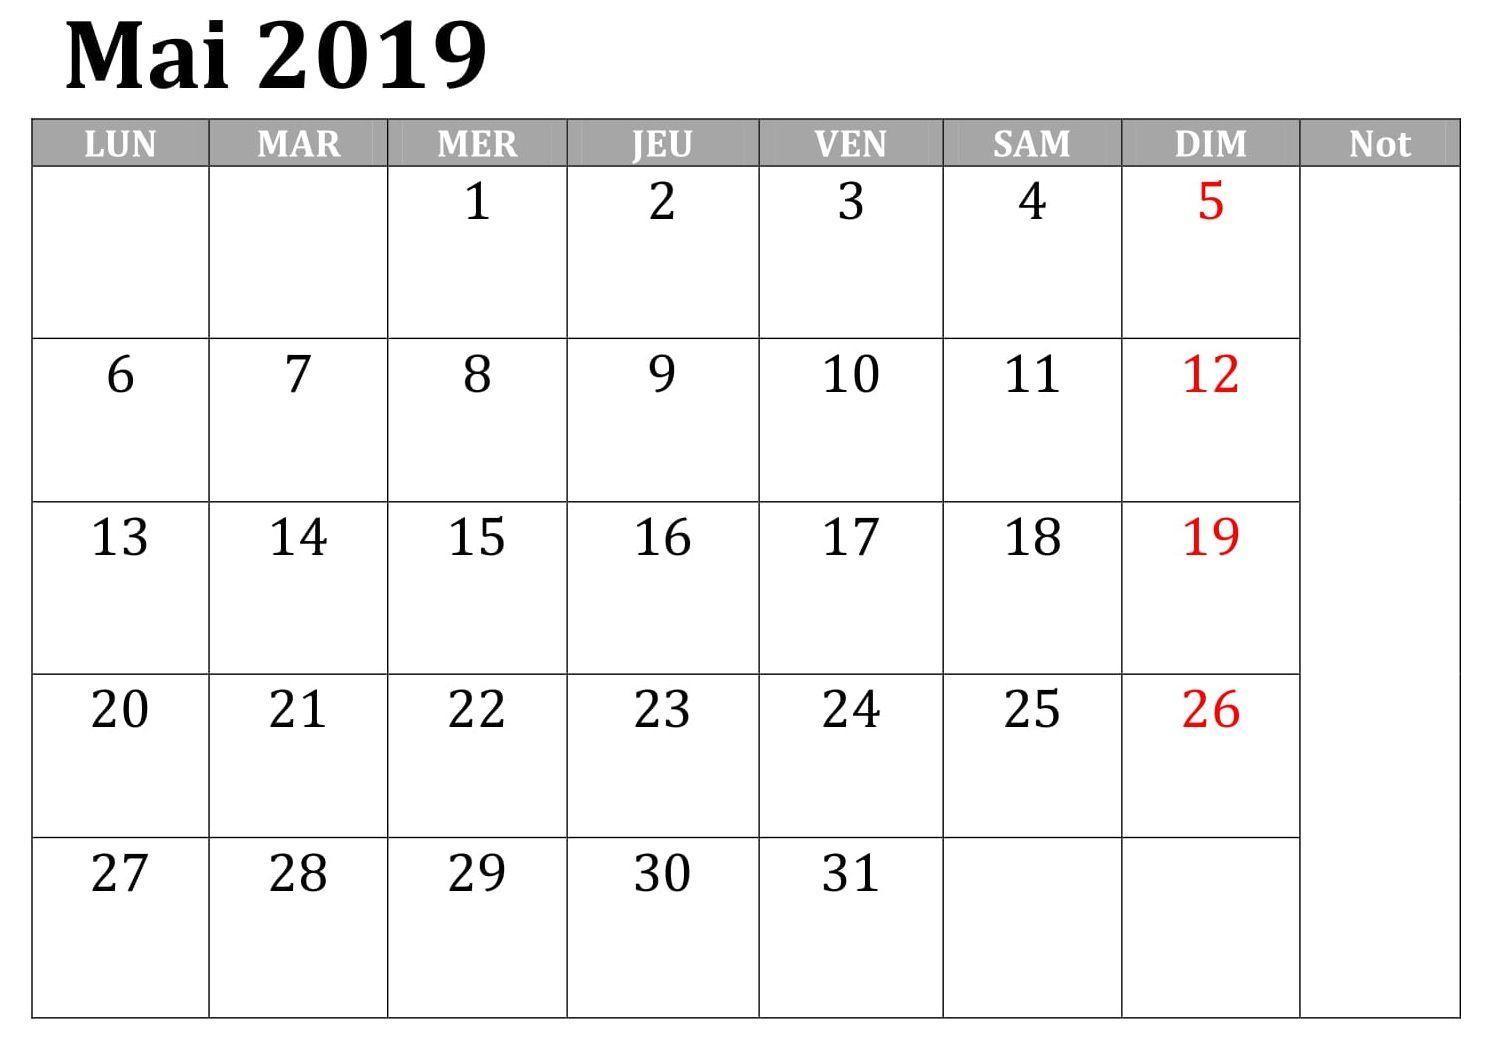 Calendrier Mai 2019 A Imprimer Gratuit.Calendrier Mai 2019 A Imprimer Gratuit Mai Mai2019